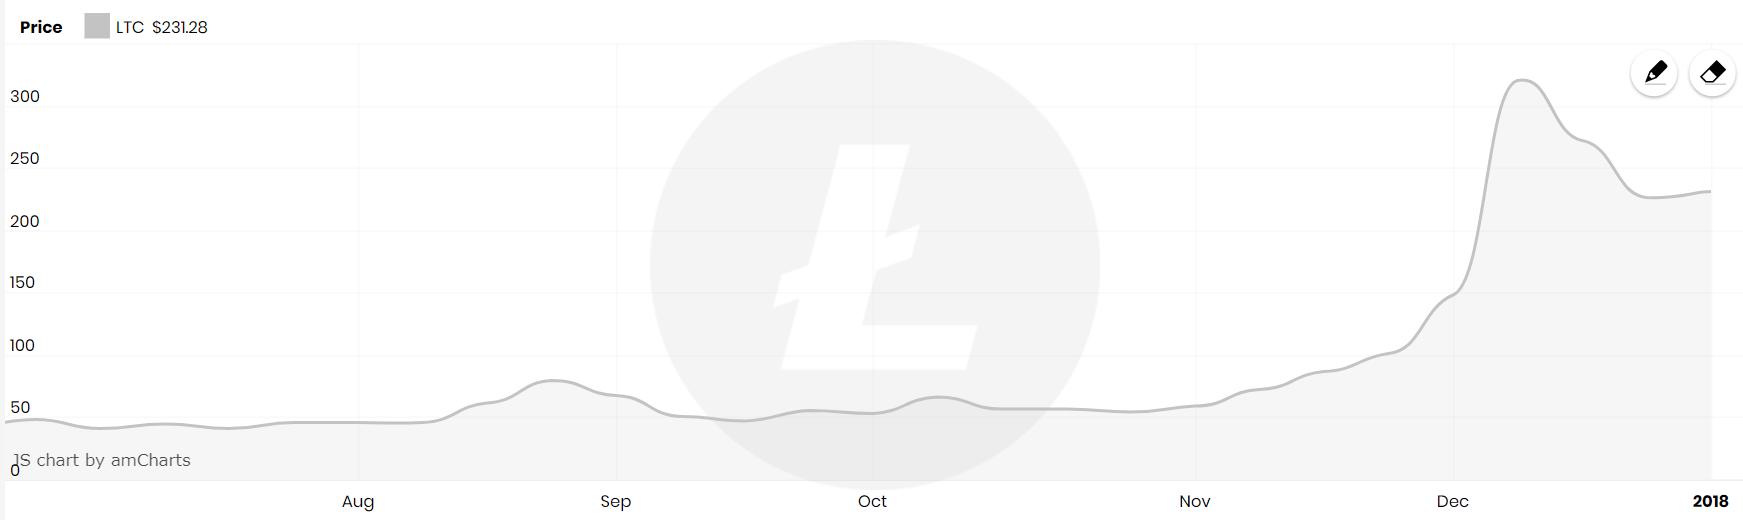 Litecoin chart, Source: CryptoEN.com